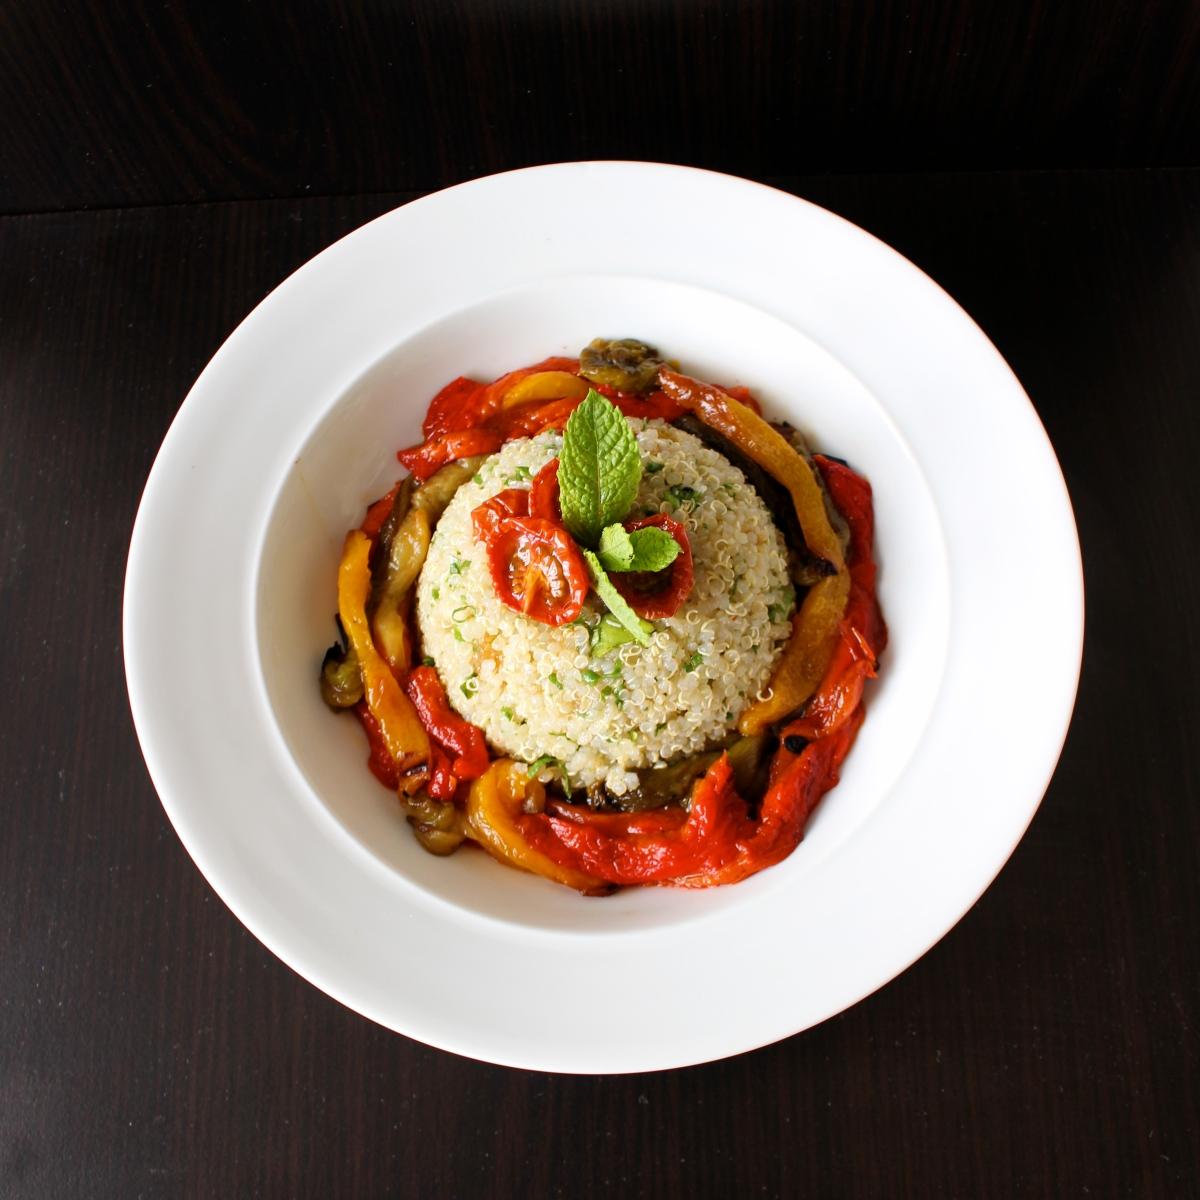 Salade de quinoa, poivrons grillés et tomates confites